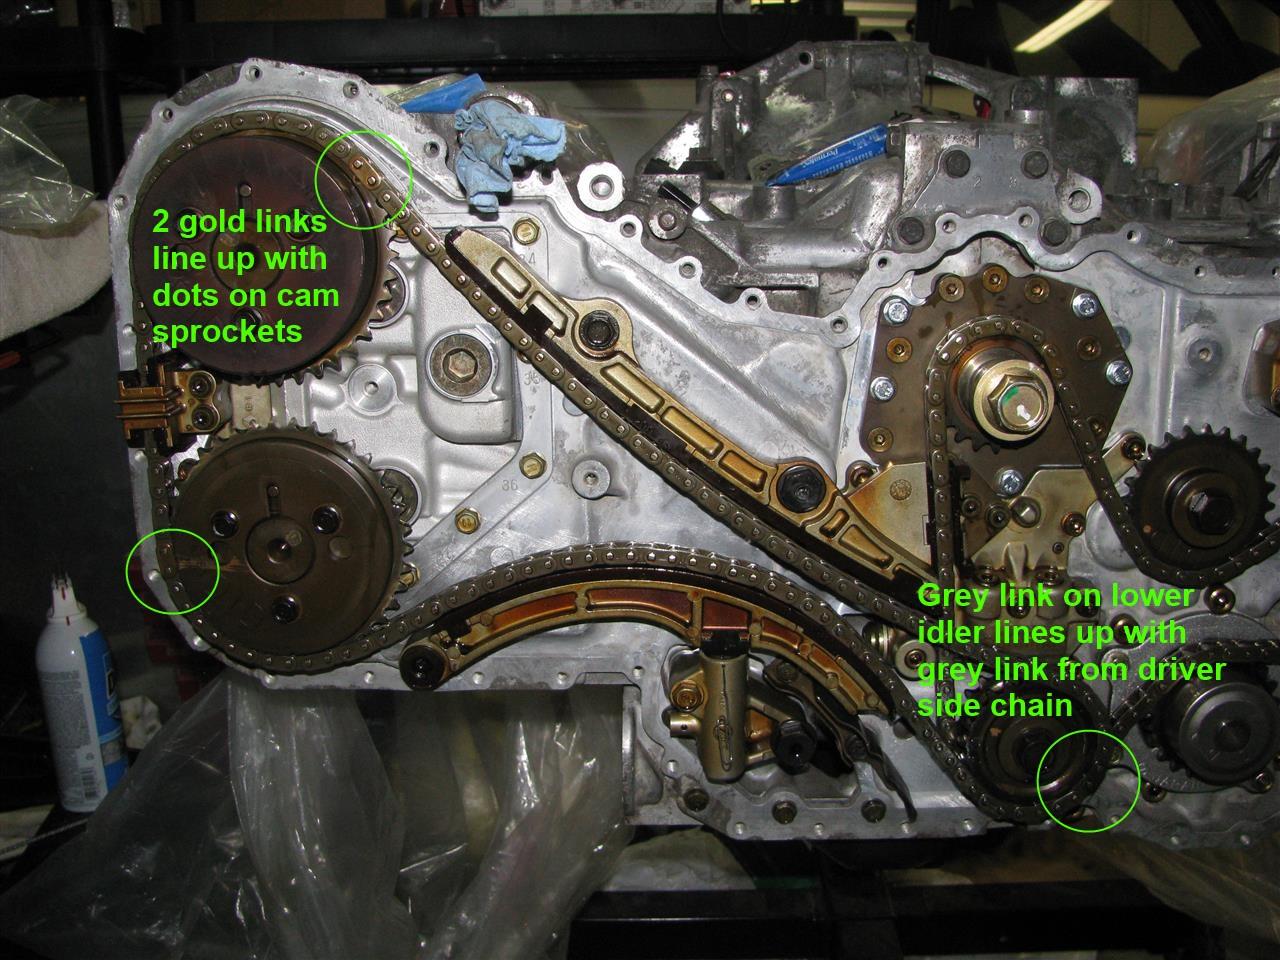 Belt Diagram Subaru 2 2 Timing Belt Diagram Subaru Tribeca 2001 2009